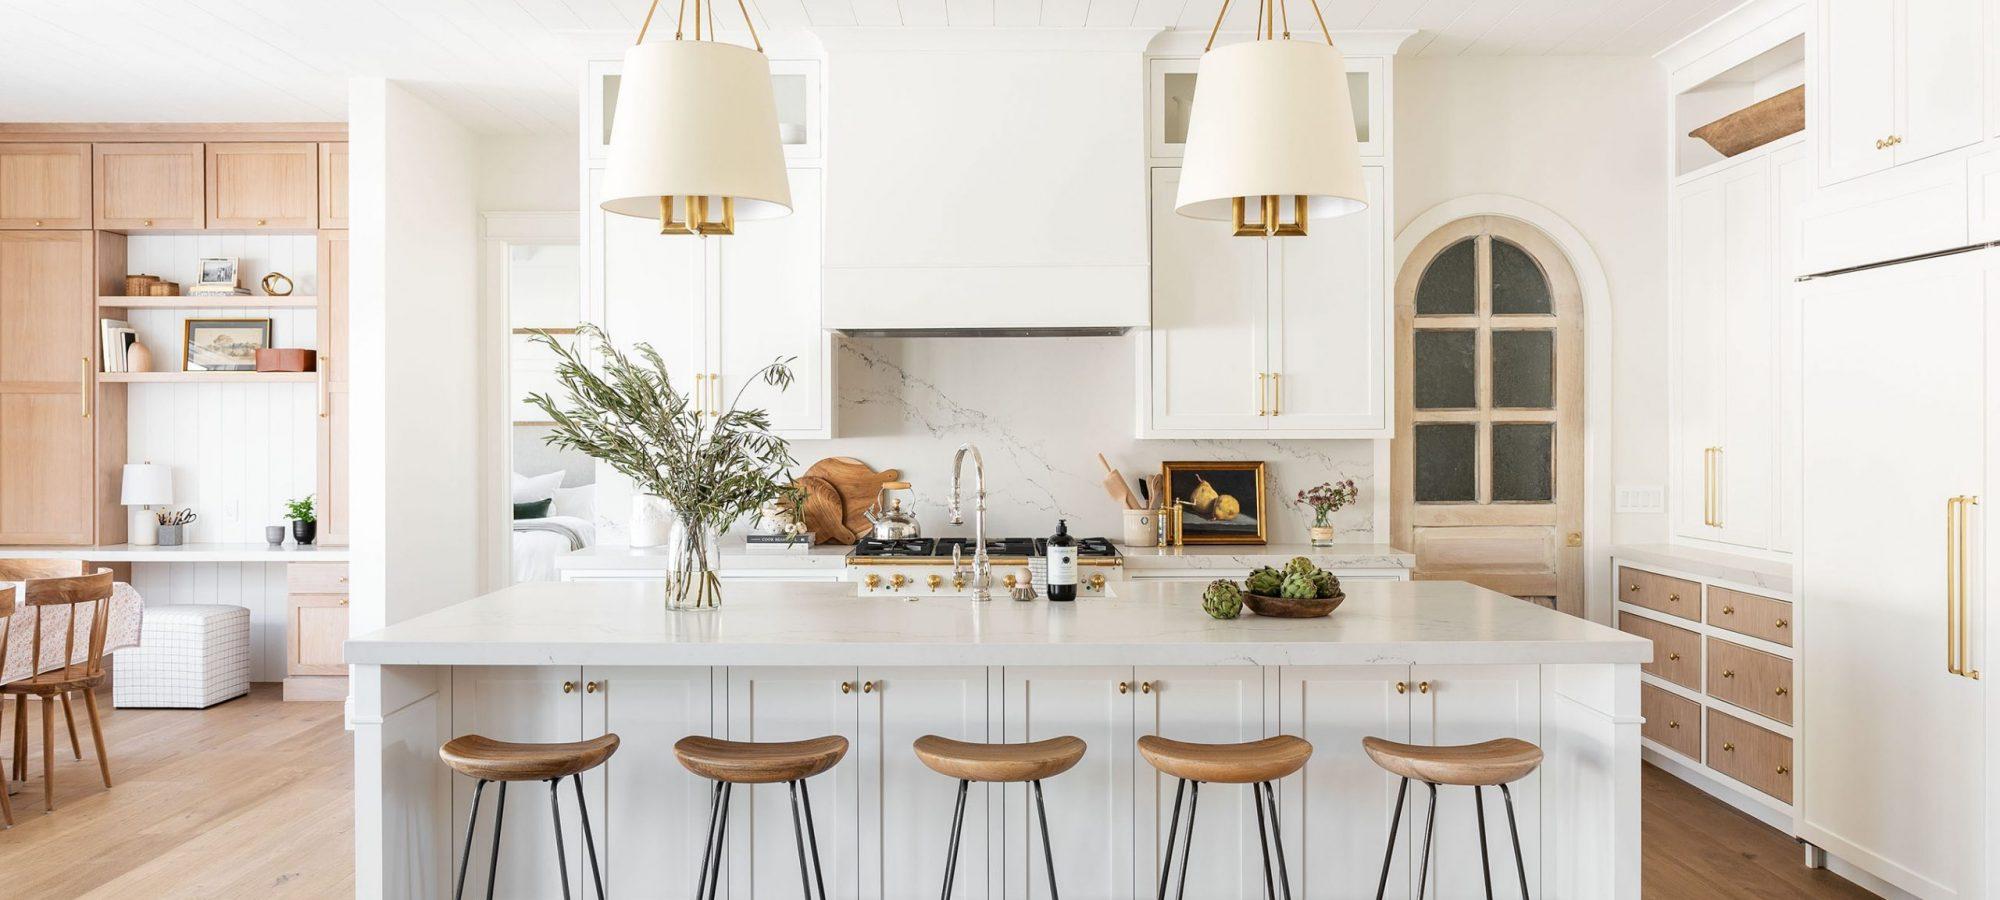 Arizona Homestead: Kitchen & Primary Suite